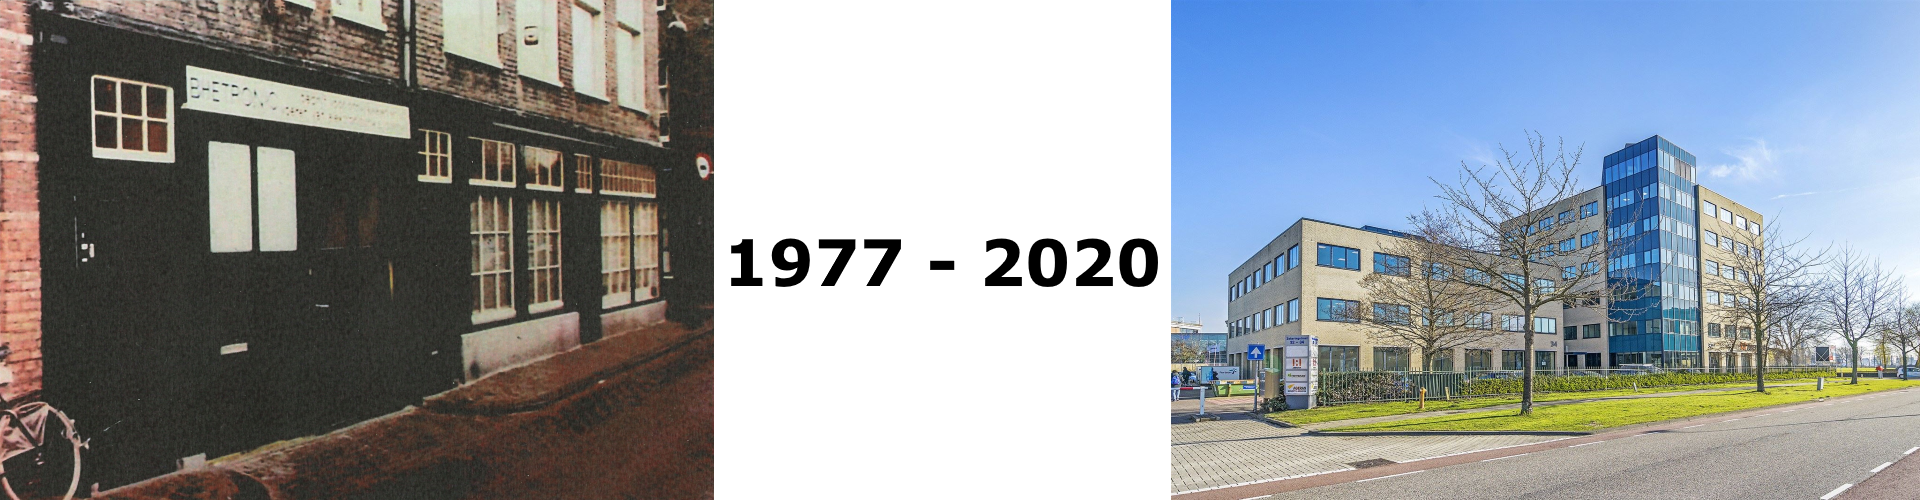 Betronic lokatie 1977 en 2020